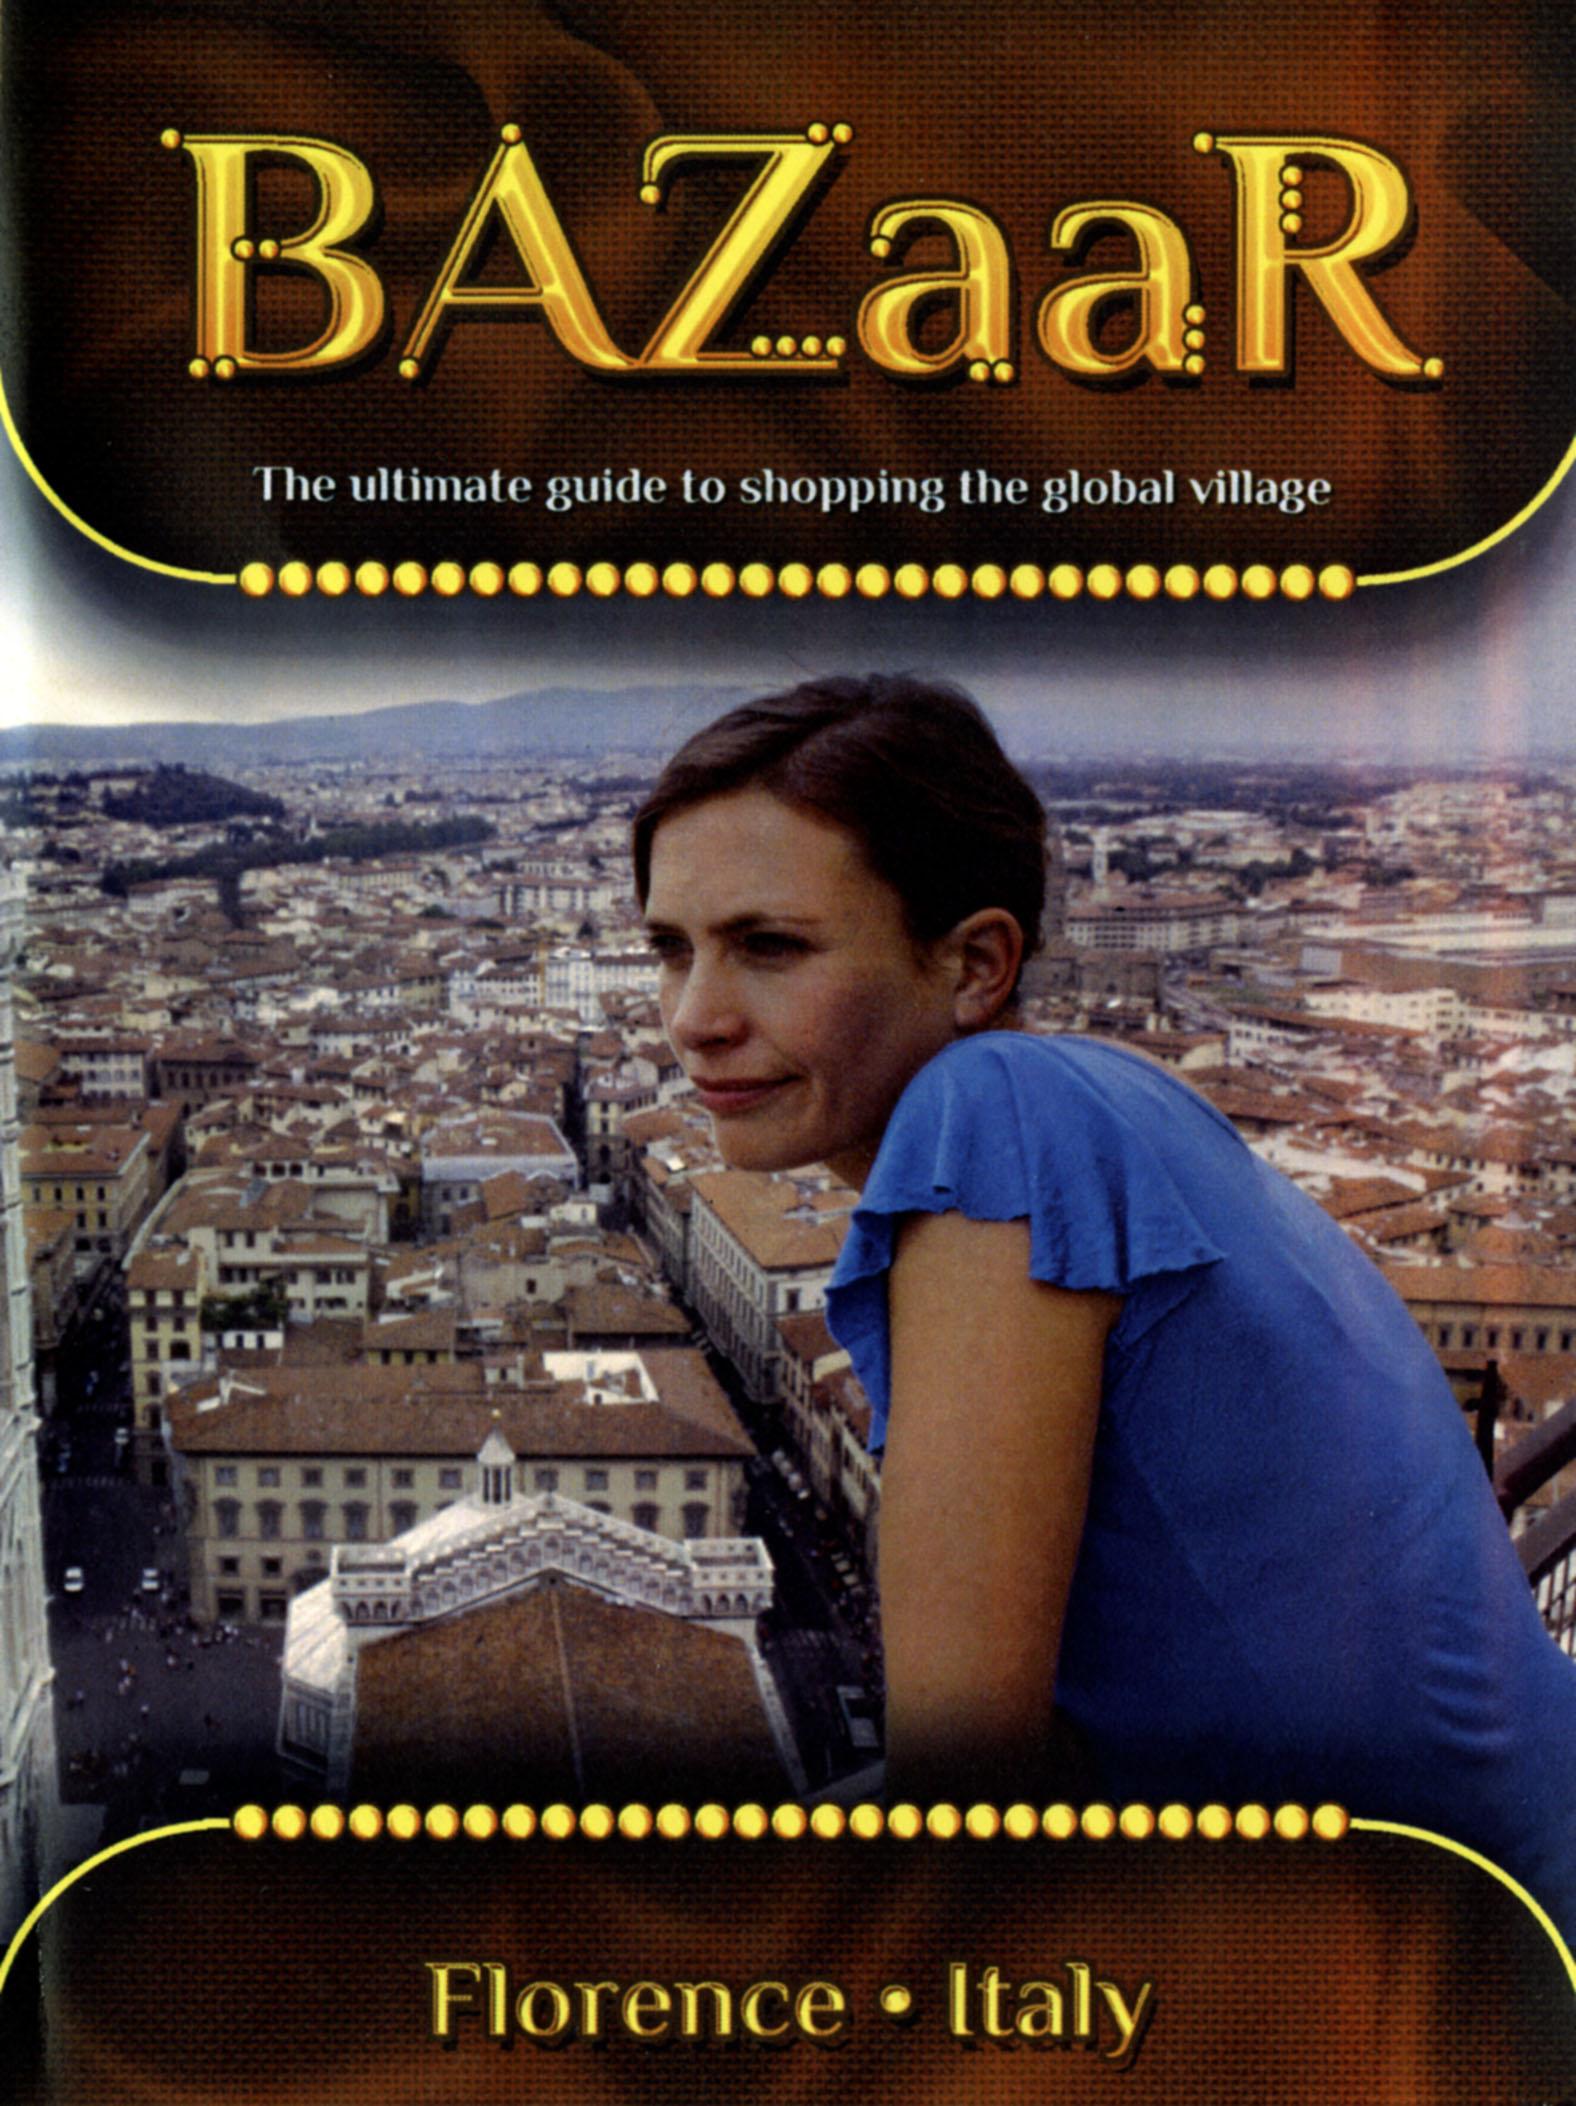 BAZaaR: Florence, Italy